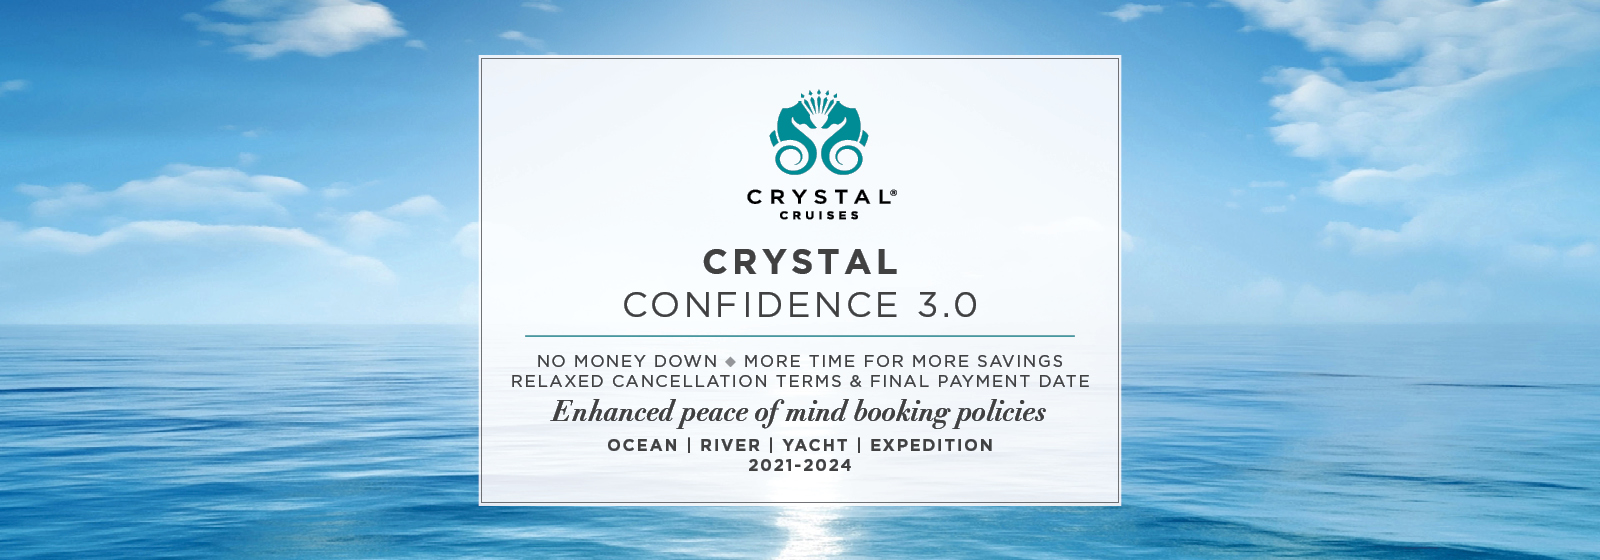 Crystal - Confidence 3.0.